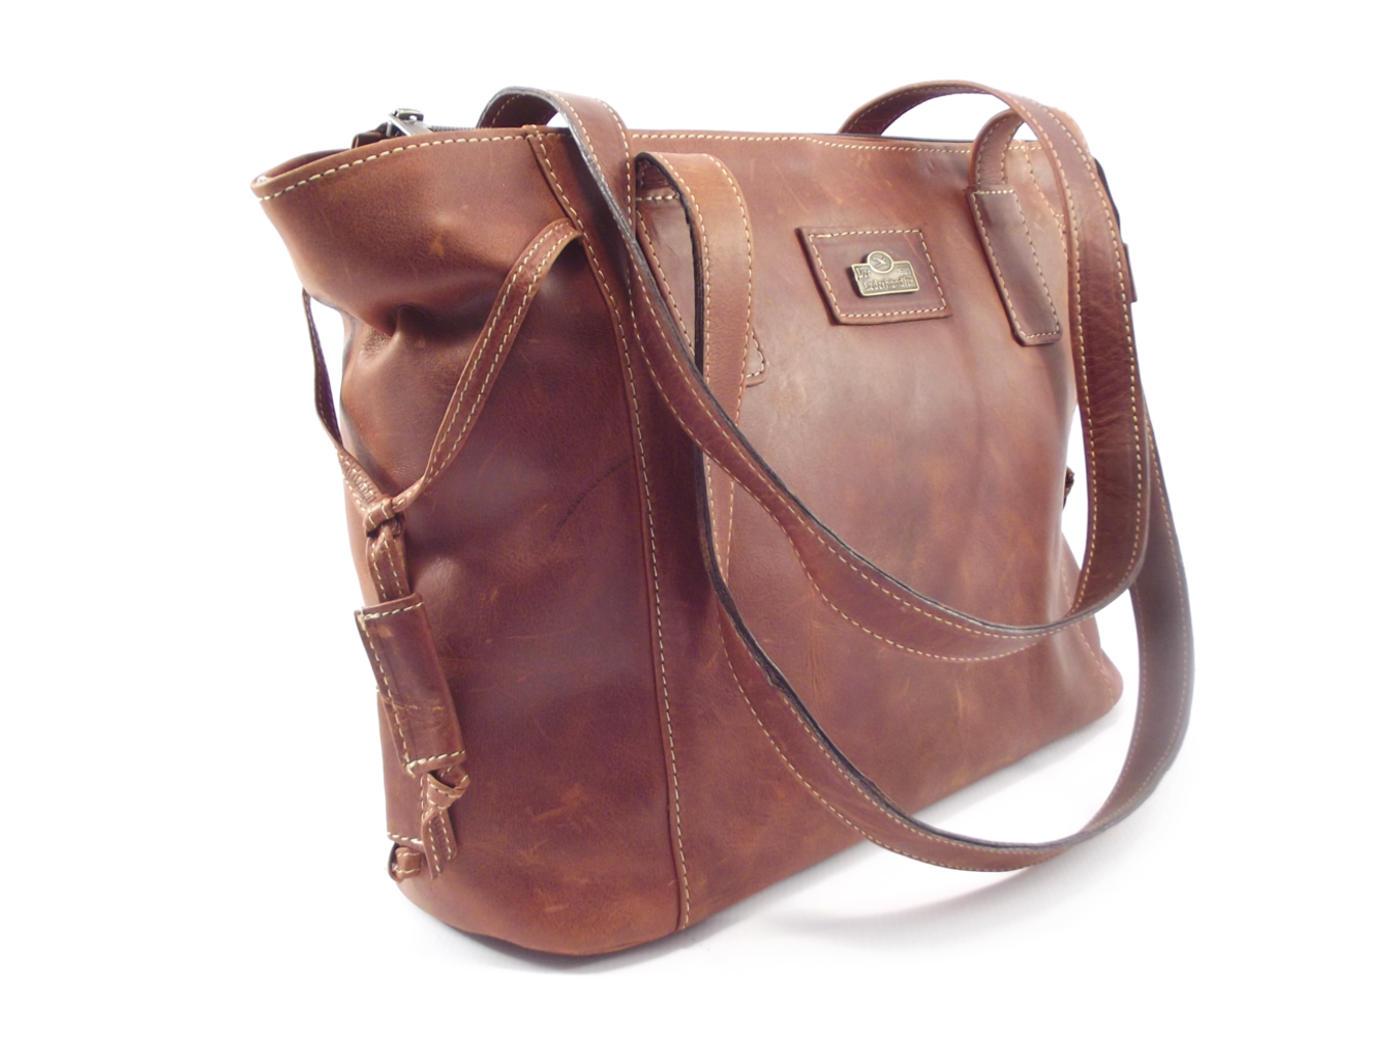 376565129bb9 ... half off 9a31f dc942 Medium flat tote double strap handbag Der  Lederhandler ...